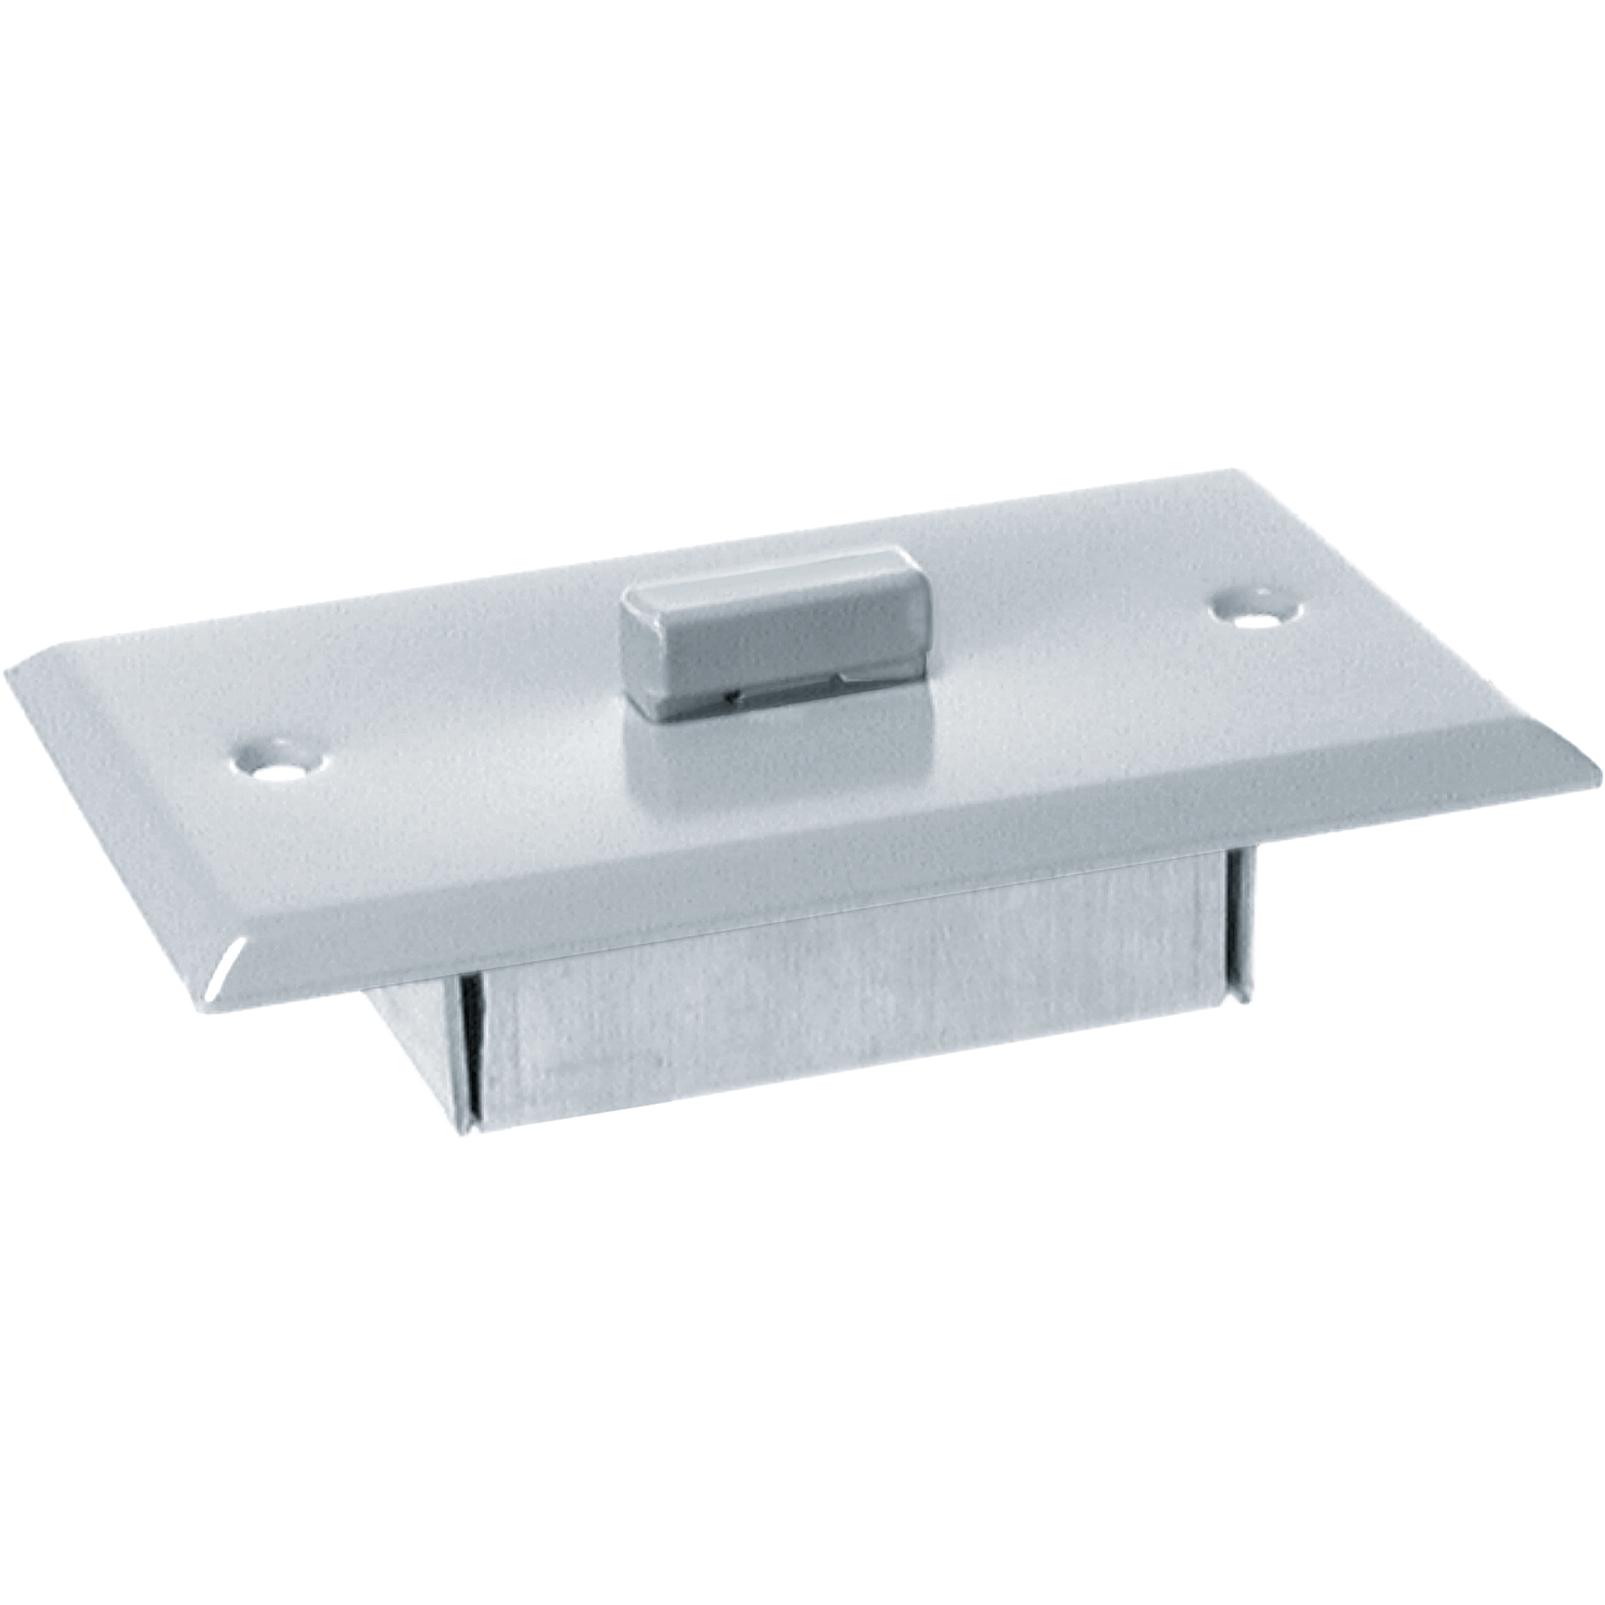 PZM11 - White - Professional flush-mount boundary layer microphone - Hero